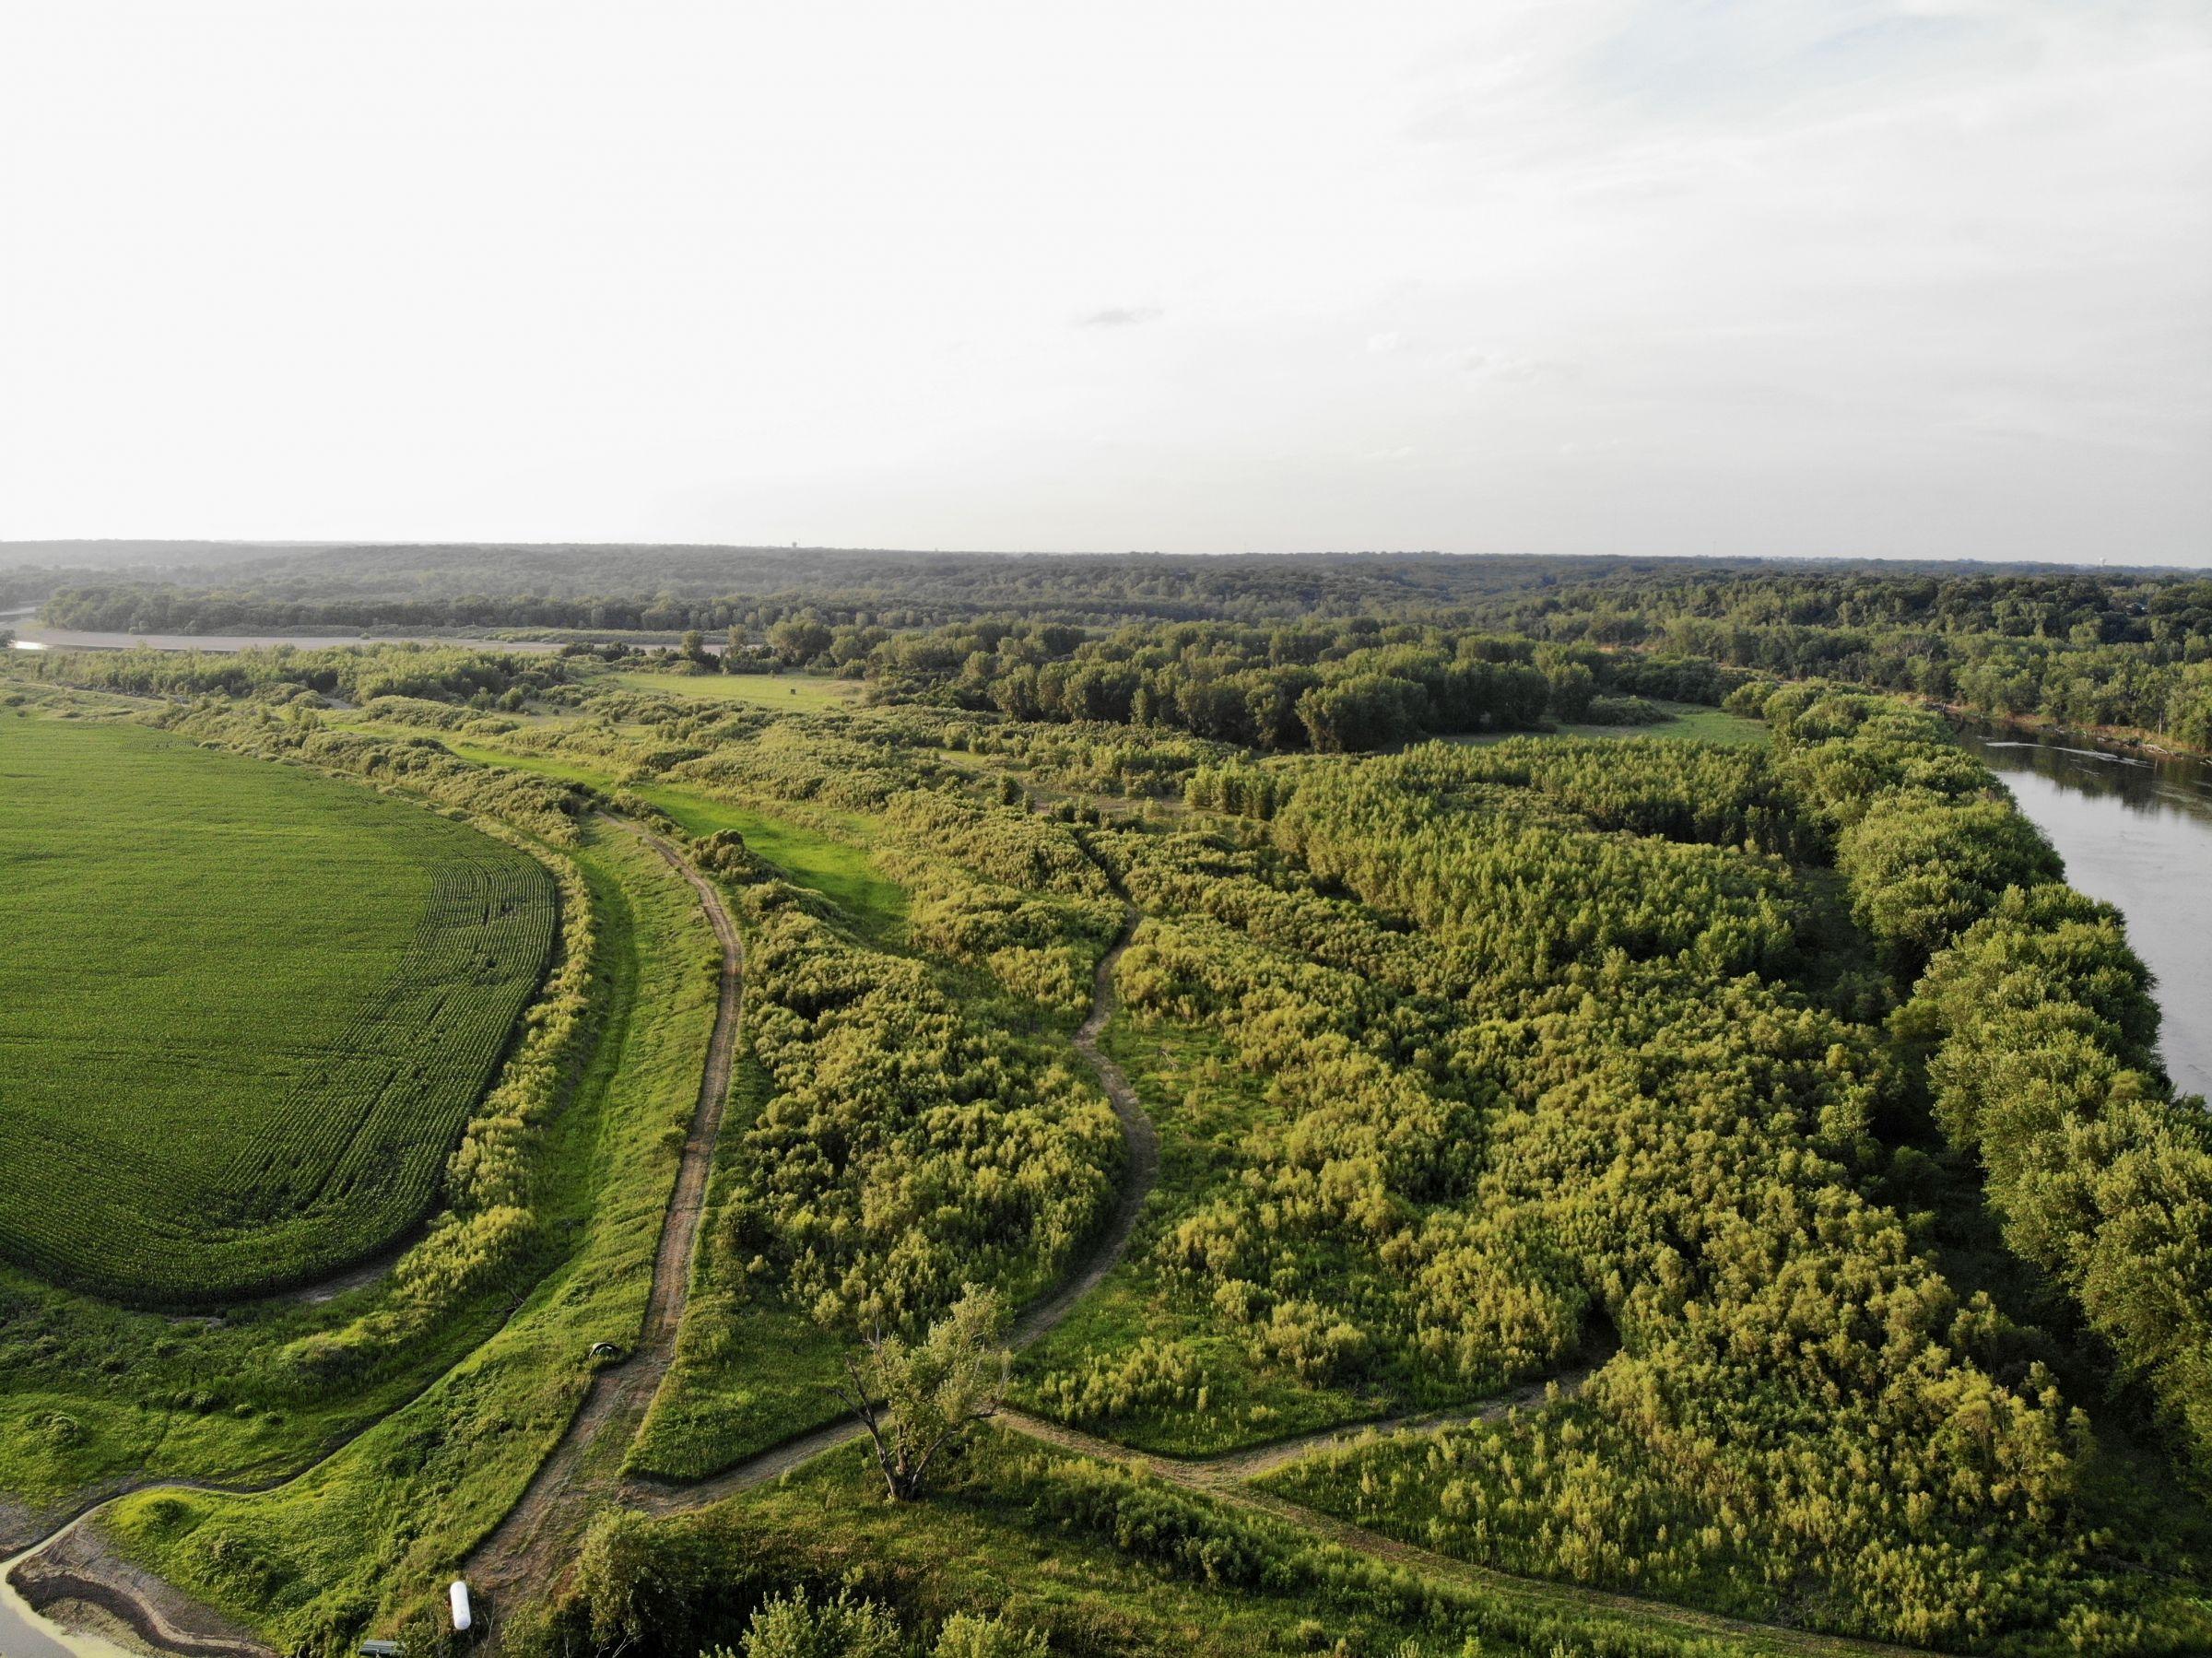 land-warren-county-iowa-158-acres-listing-number-15623-4-2021-07-07-211321.jpg